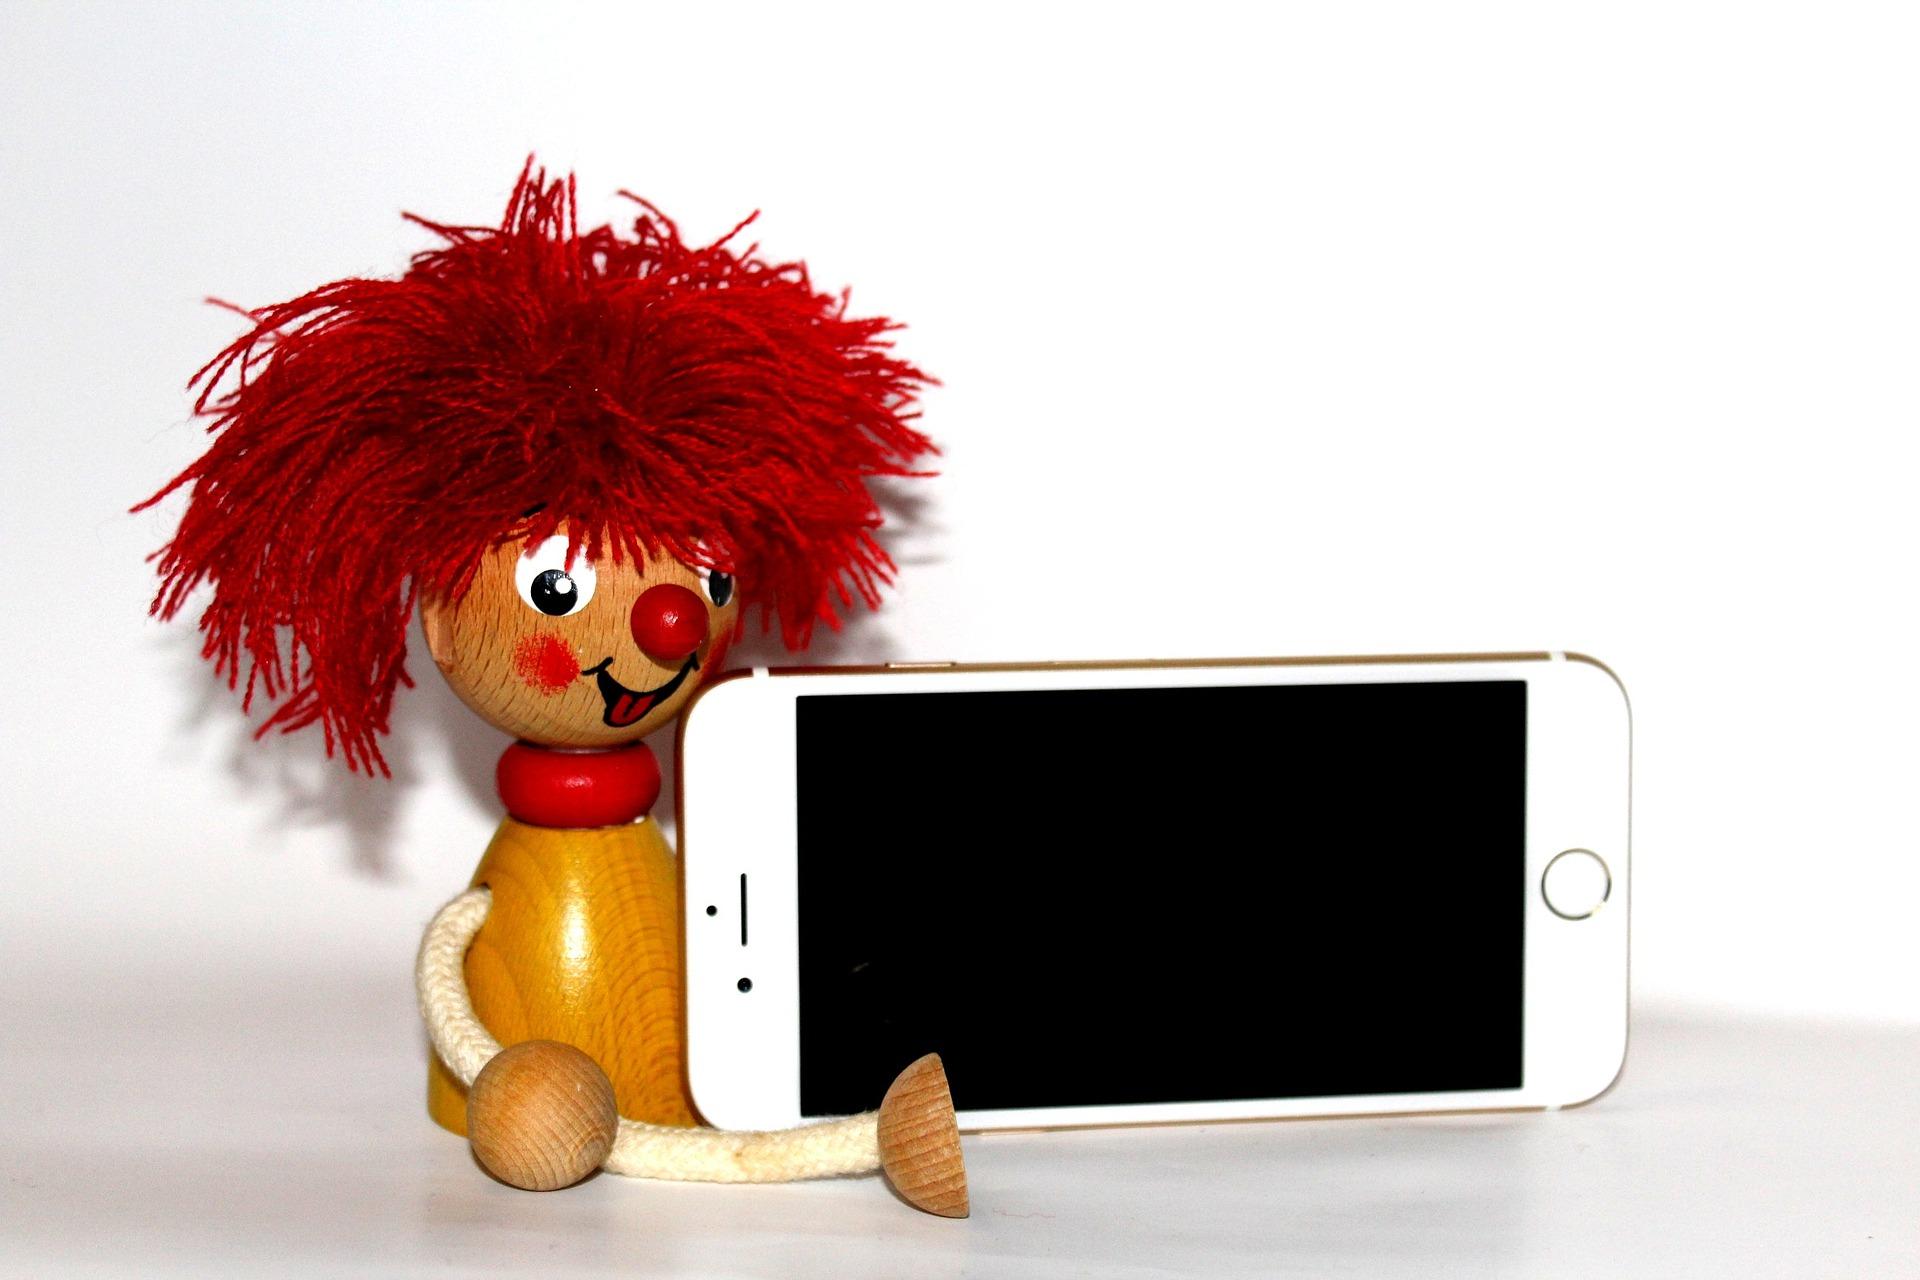 iphone-993185_1920.jpg